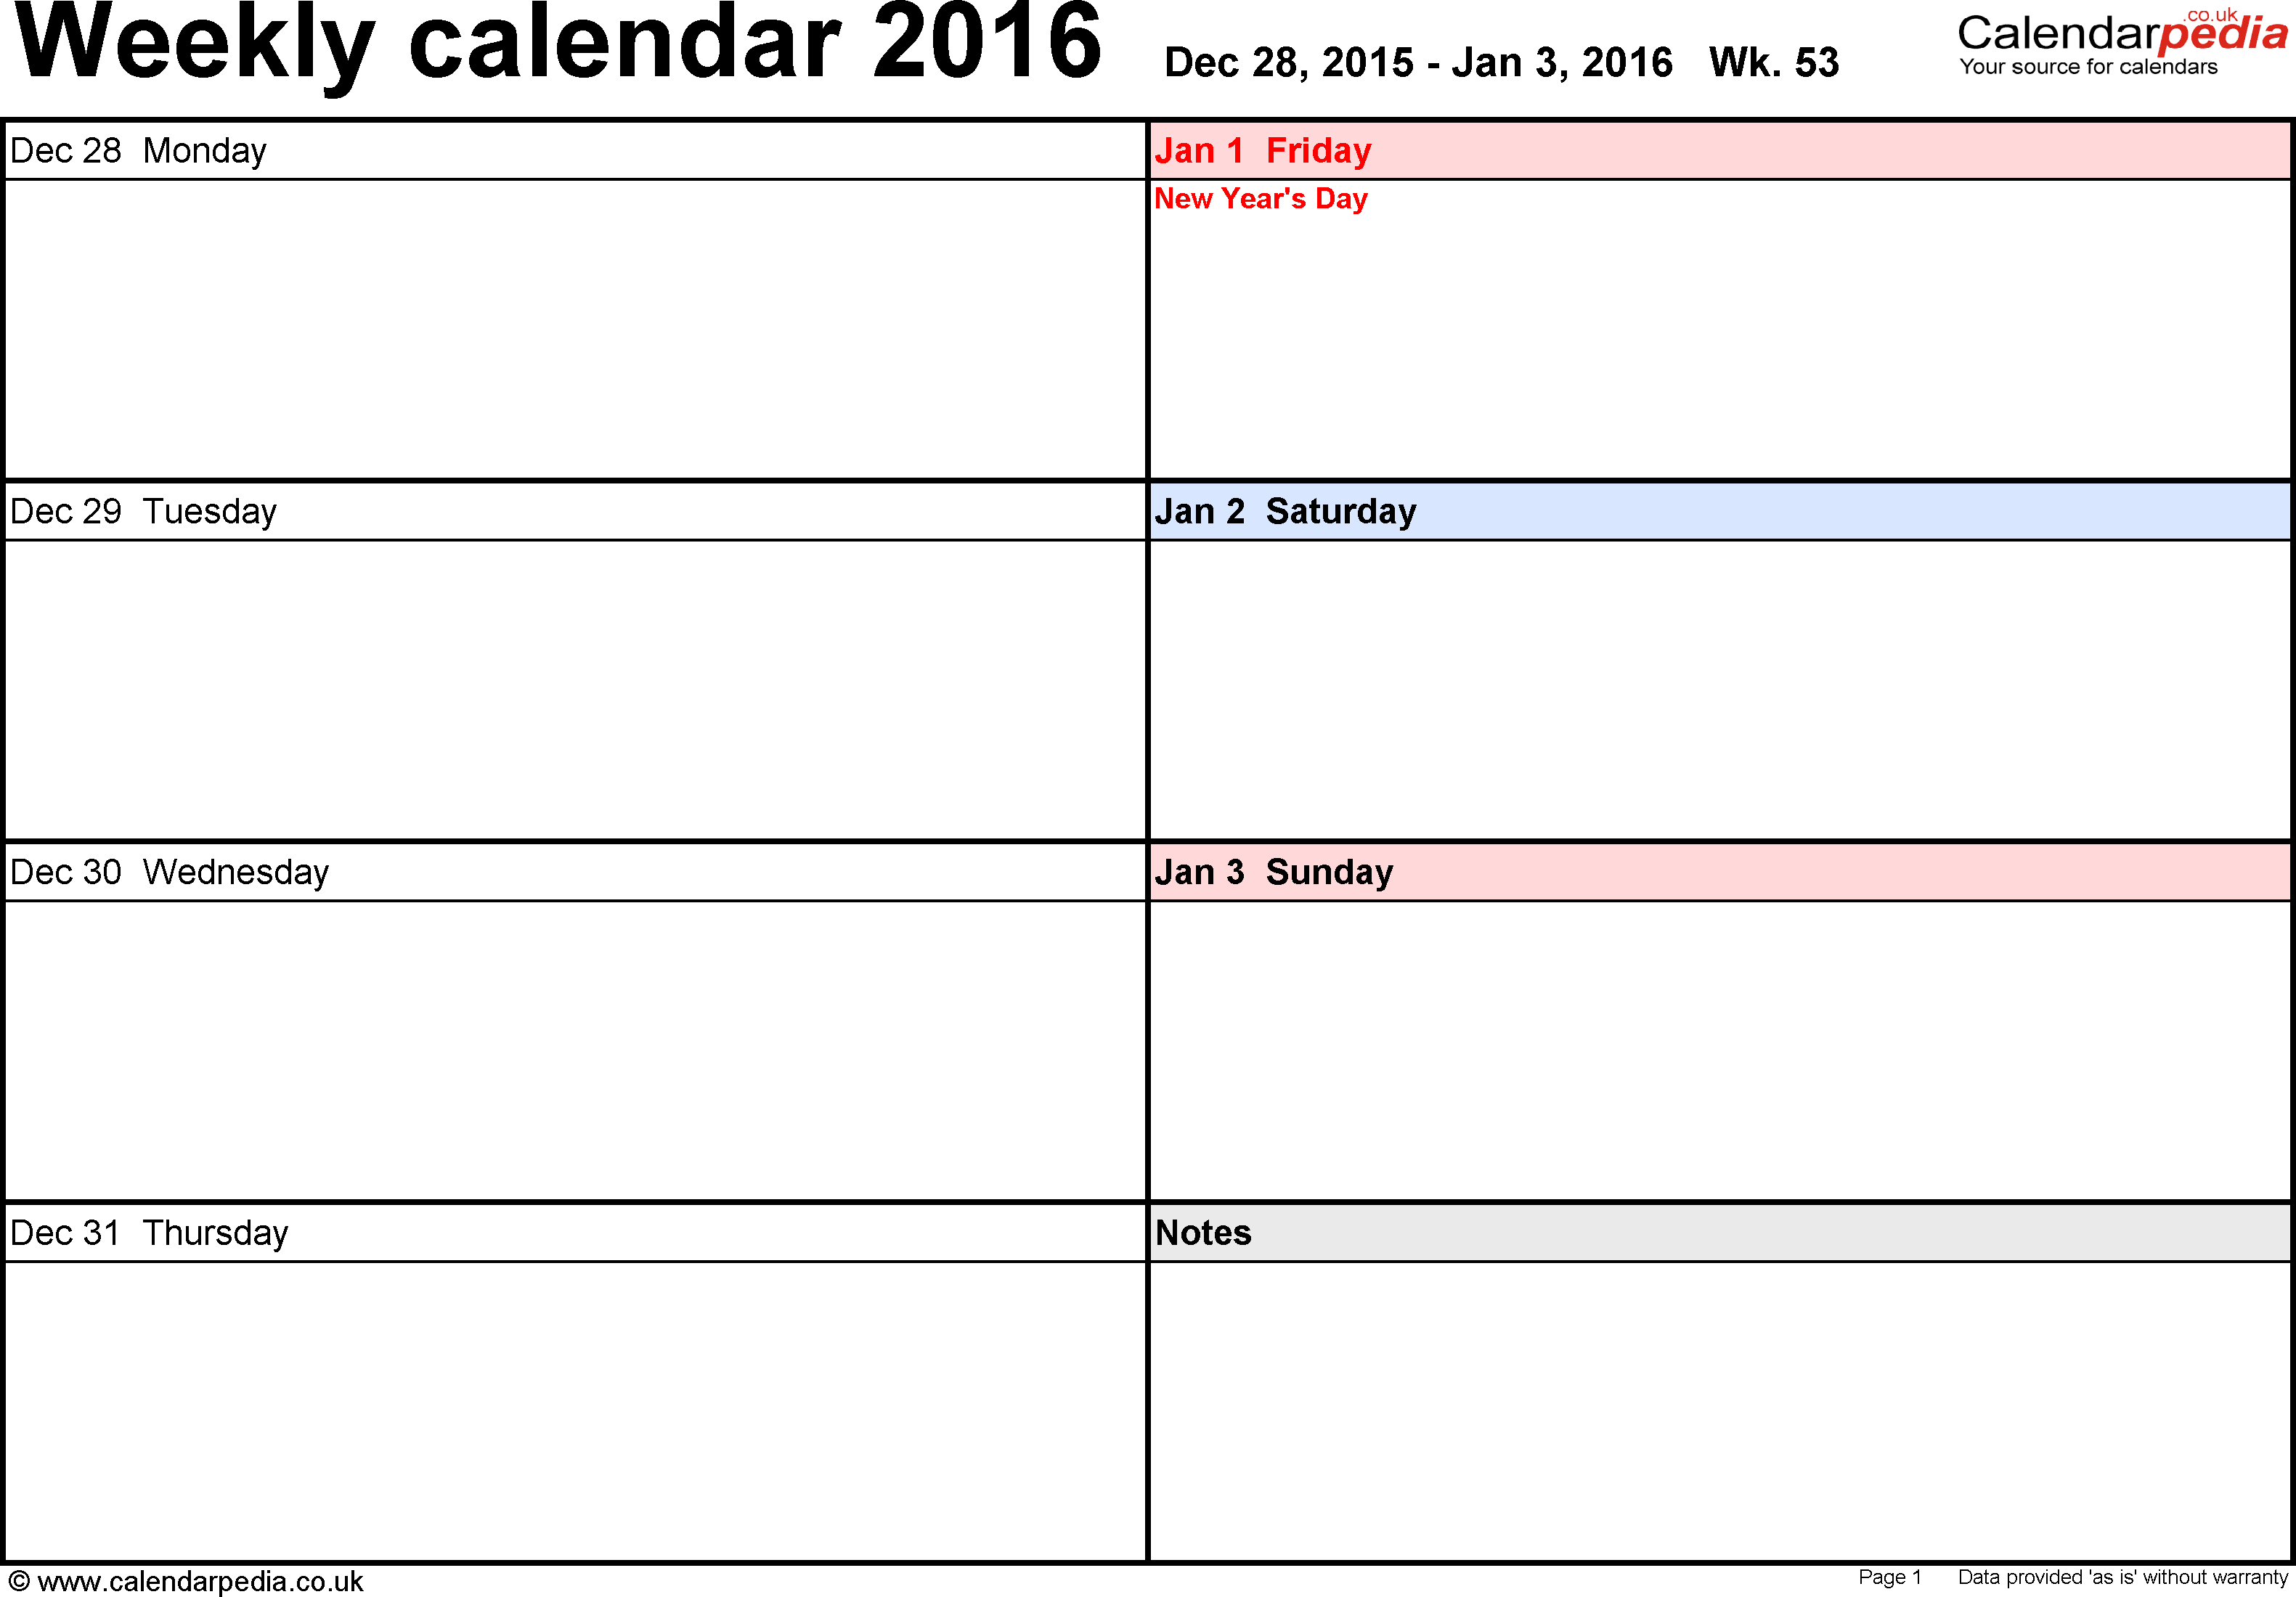 Weekly calendar 2016 UK free printable templates for Word